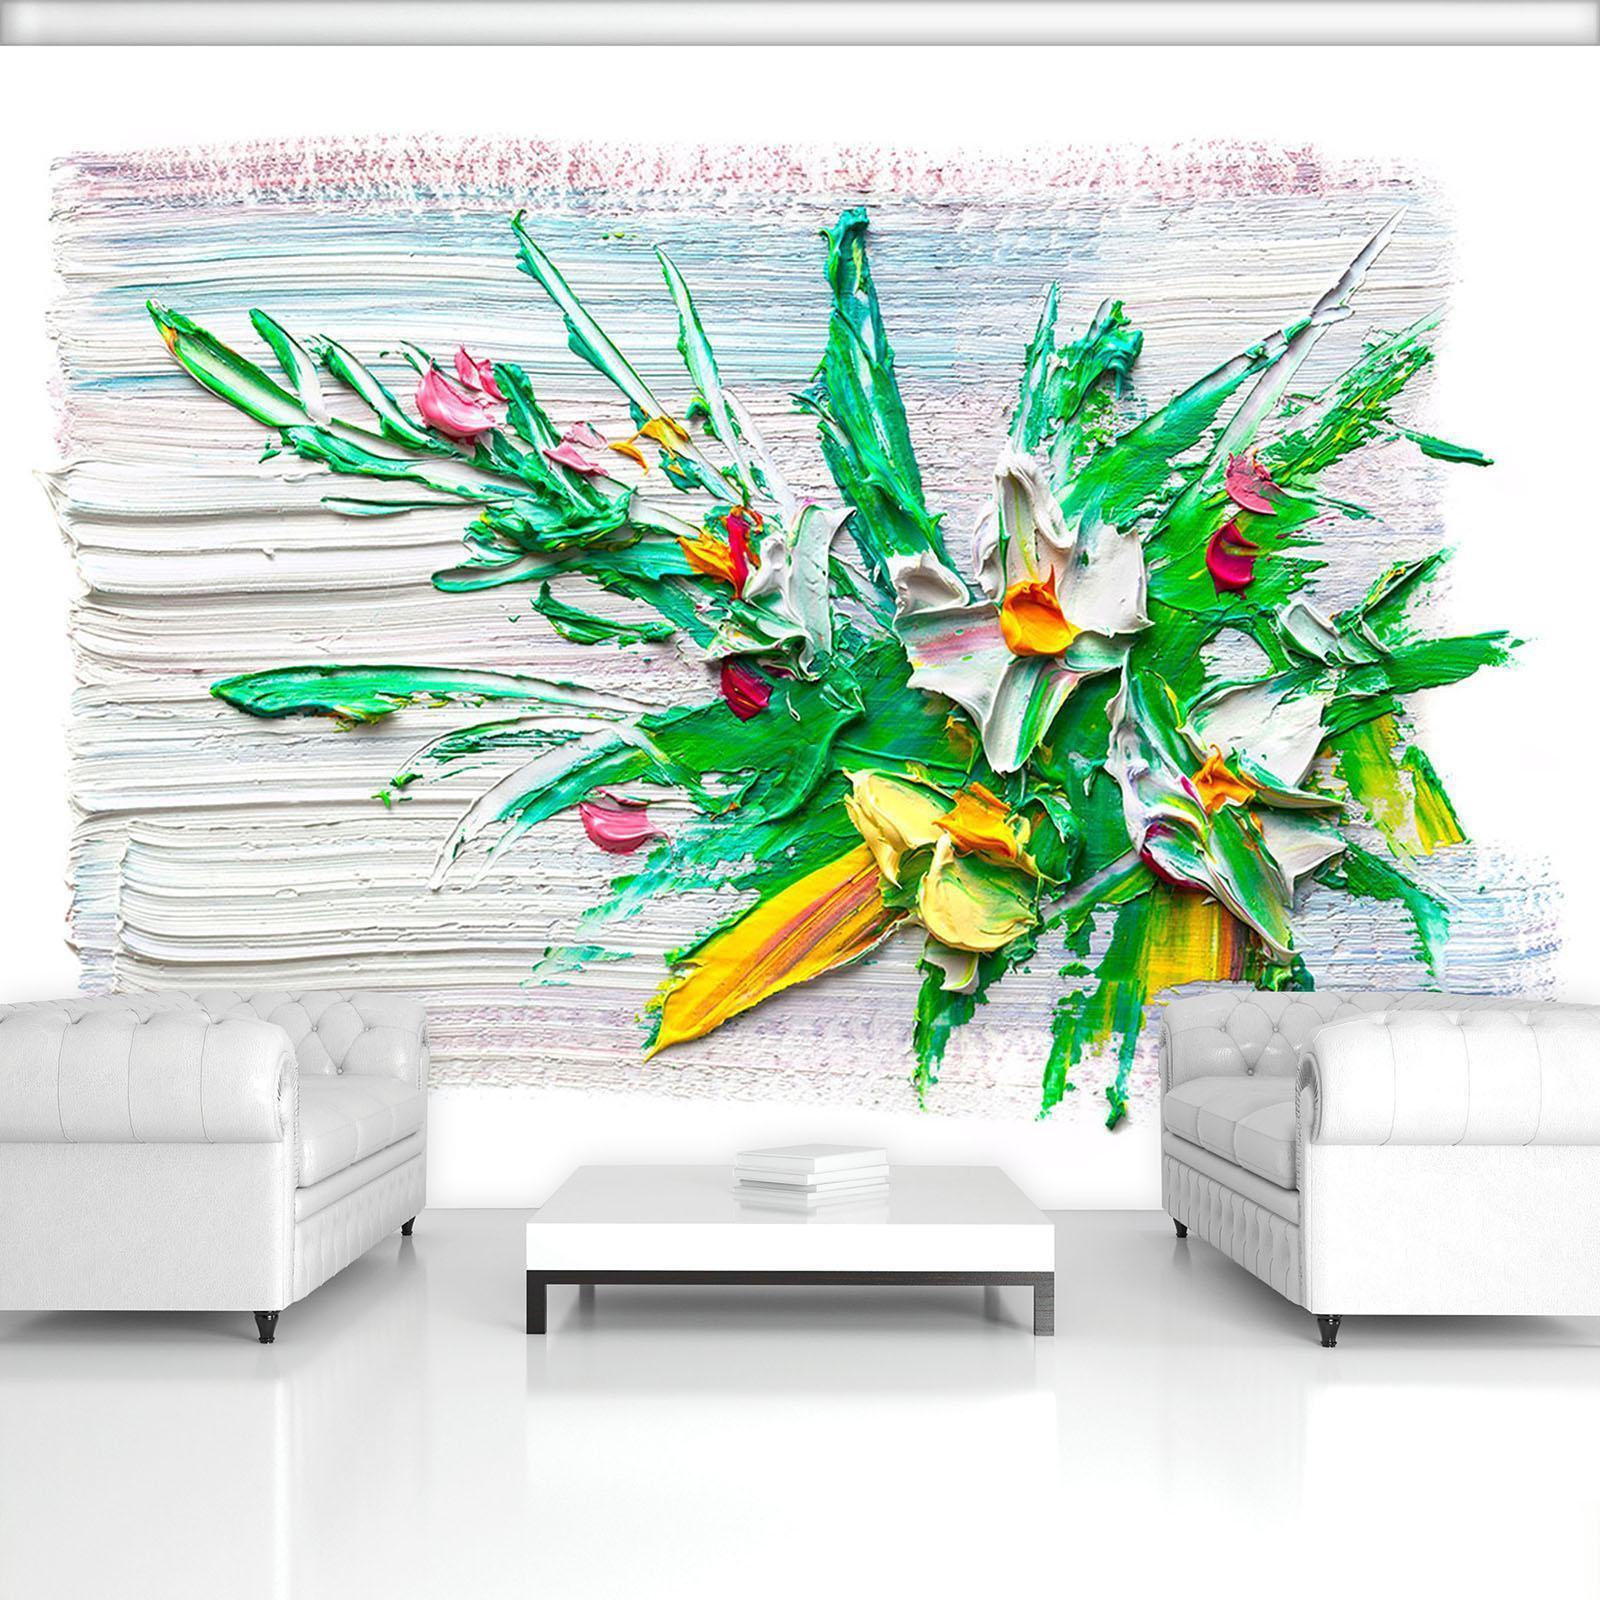 Vließ Fototapete Tapete Wandbild Wallpaper Mural Blumen –l